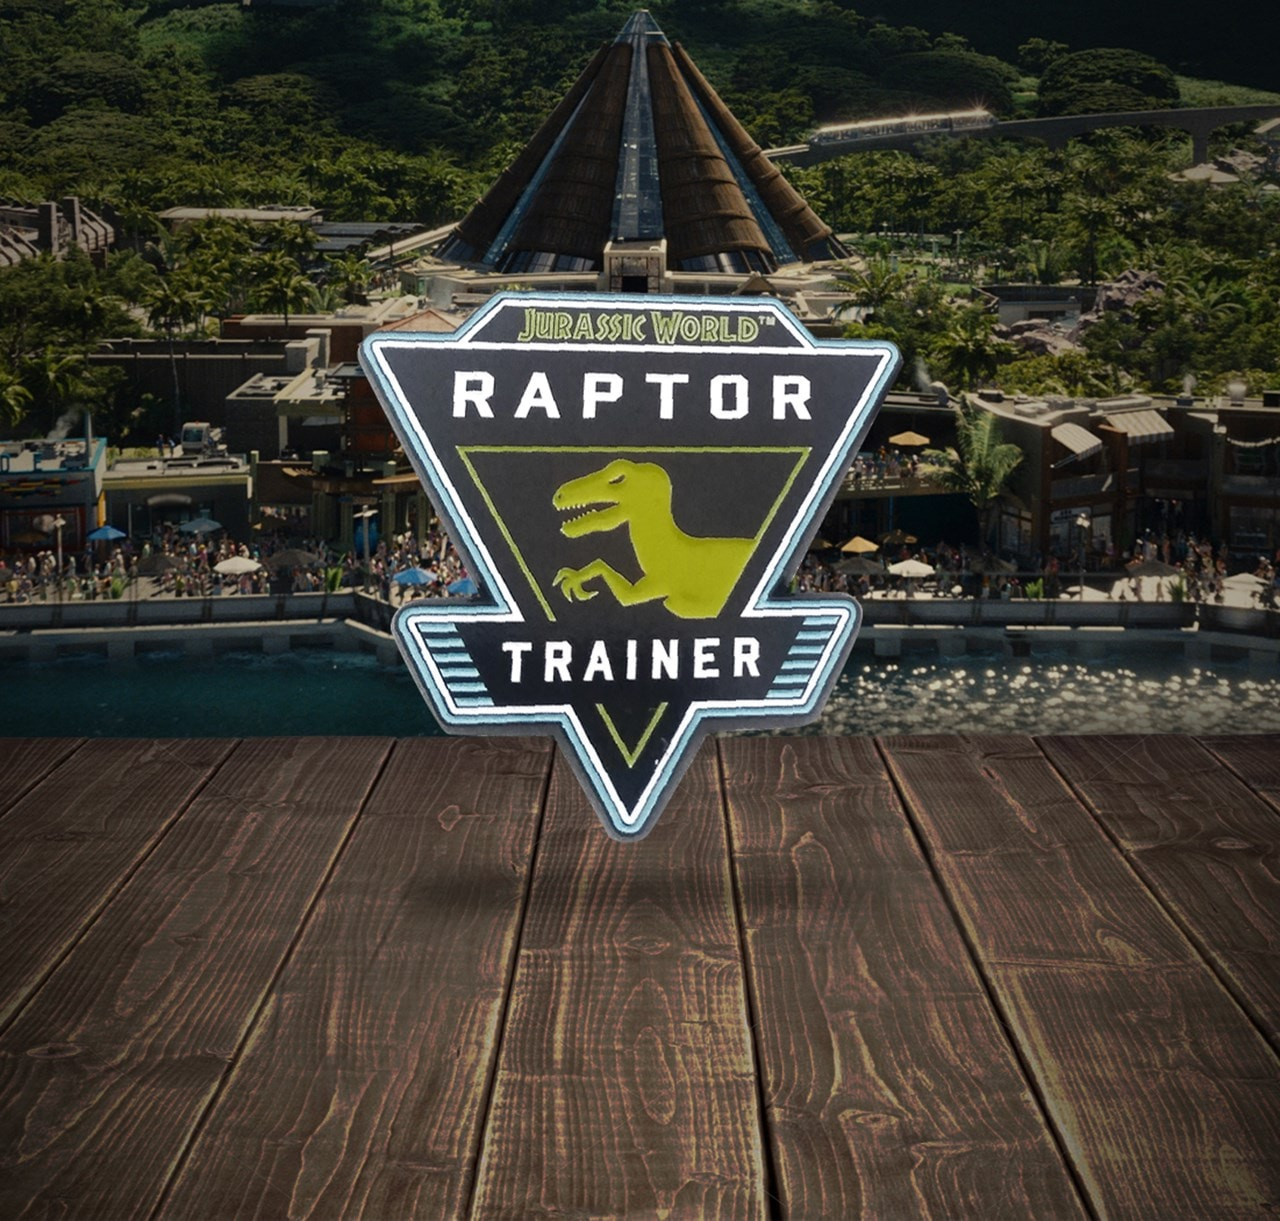 Jurassic World: Rapture Trainer Pin Badge - 3